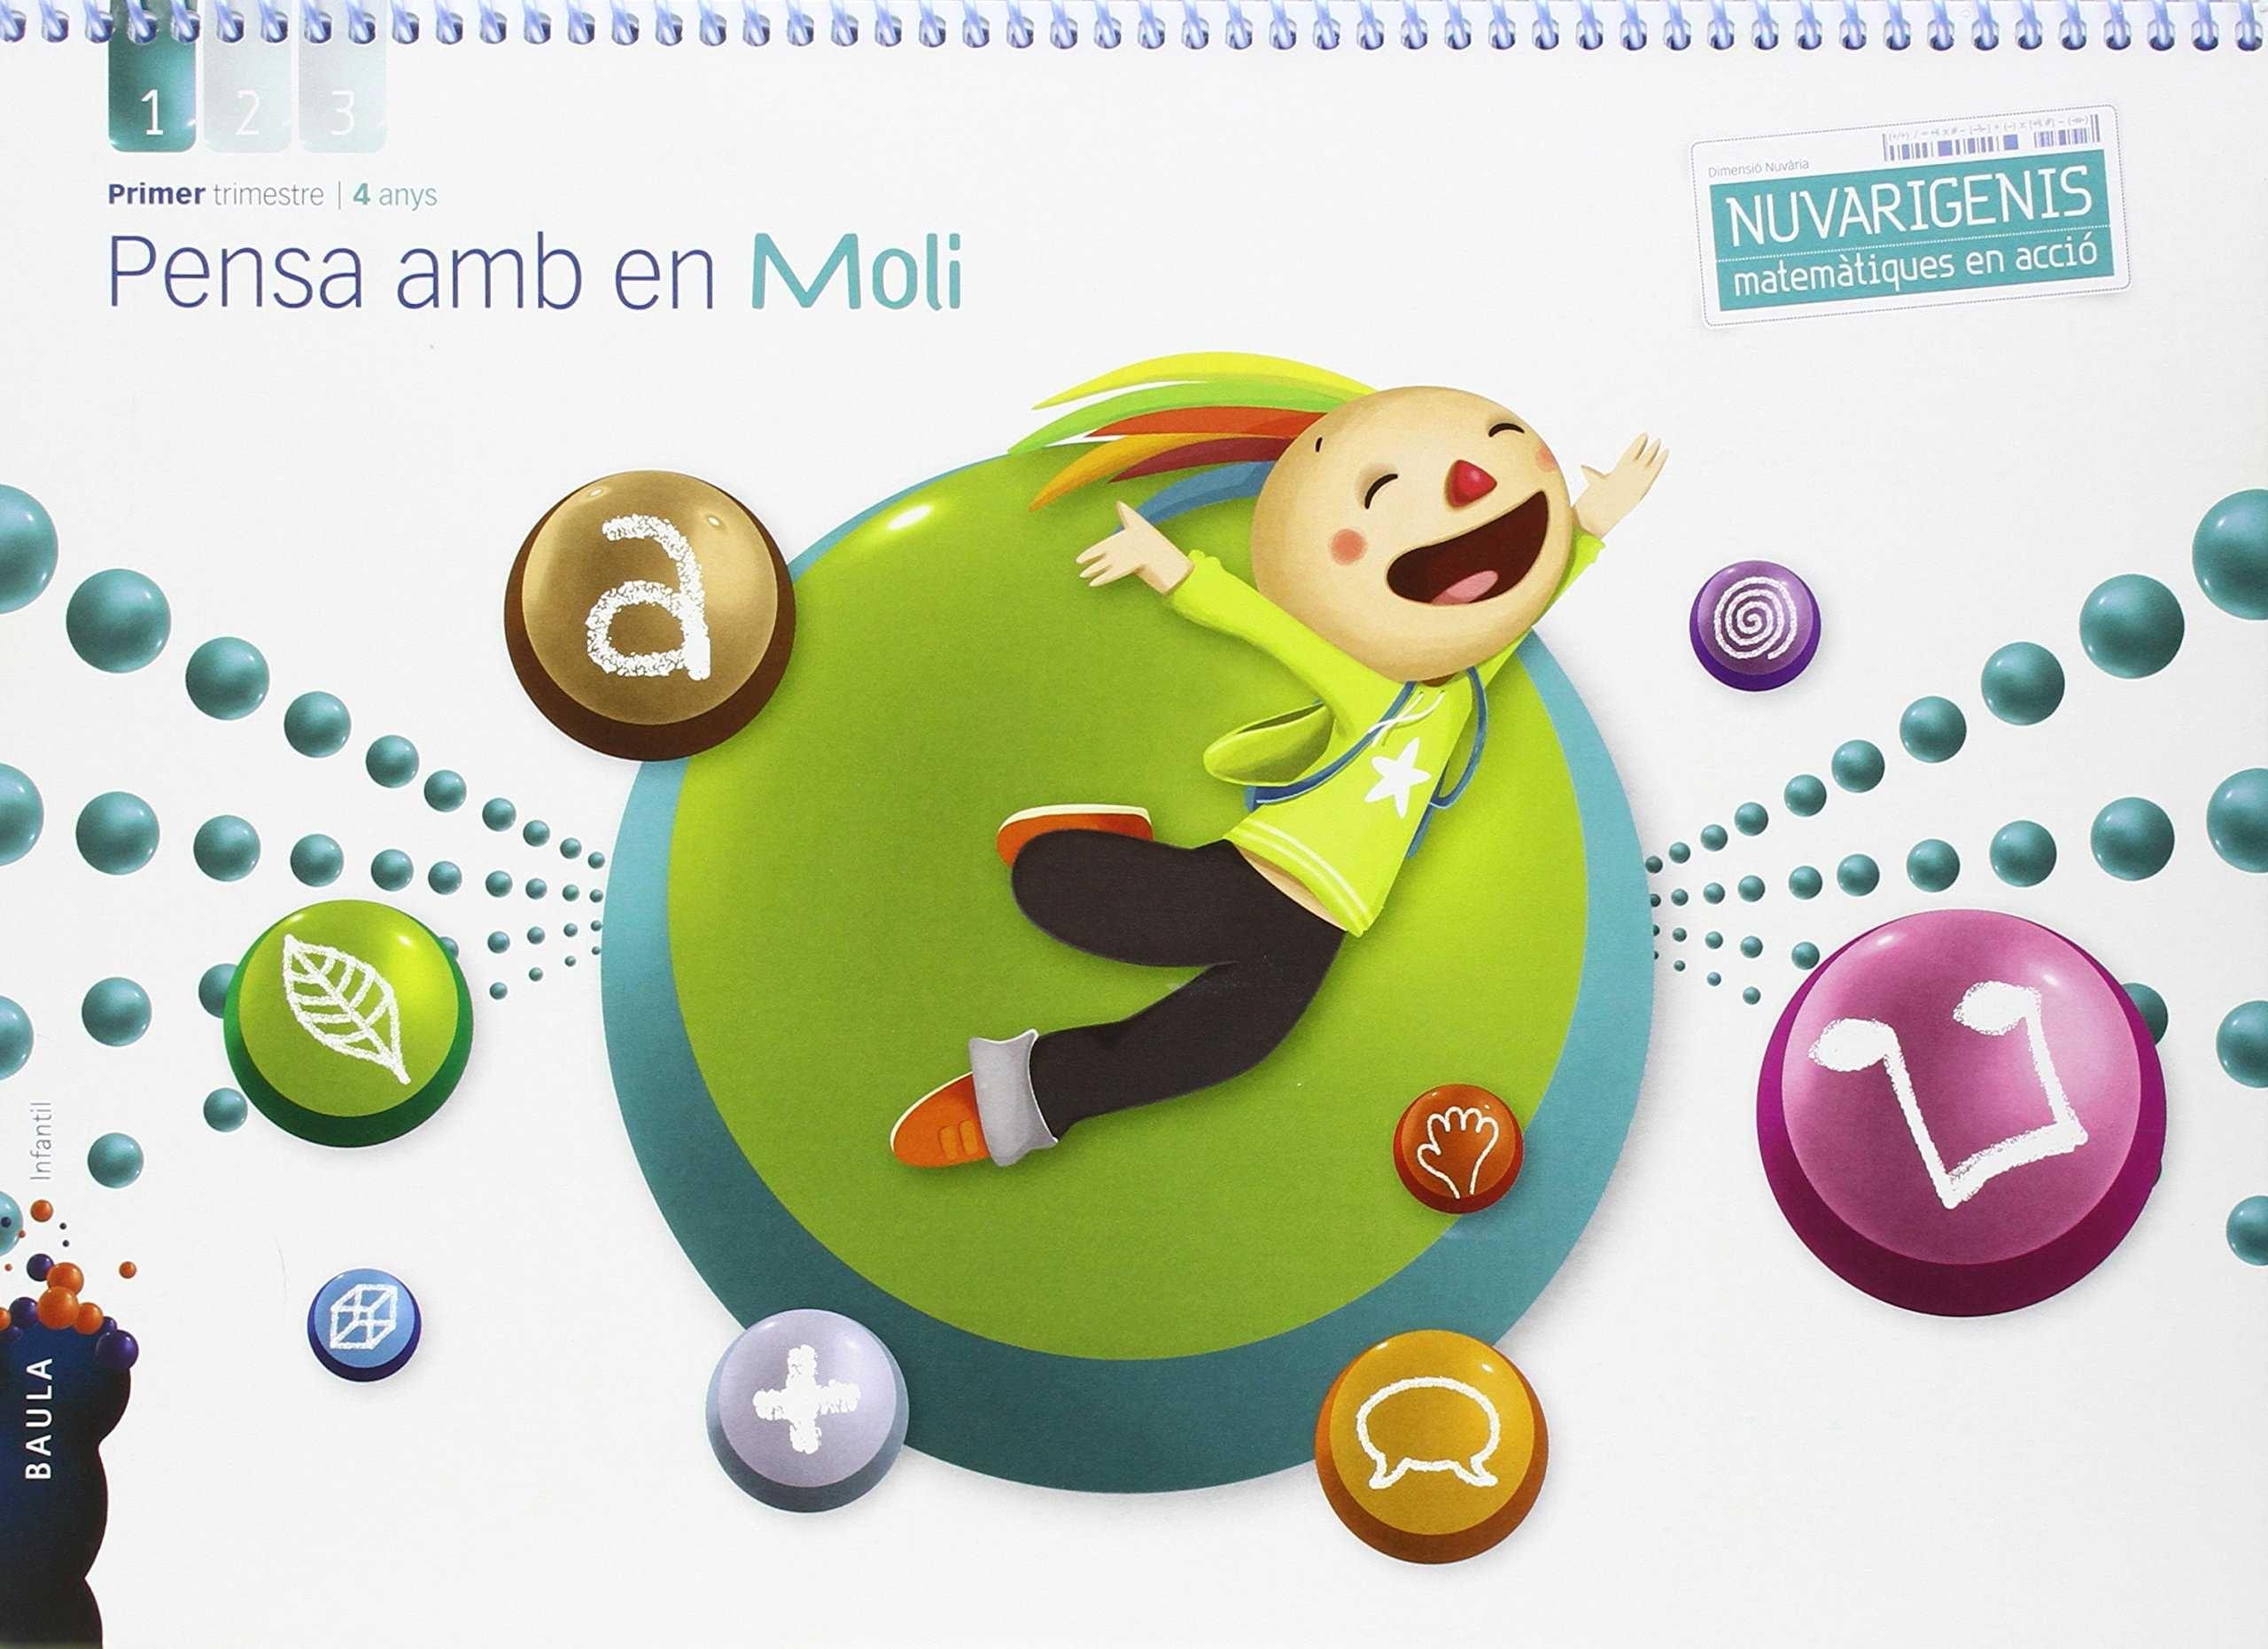 PENSA AMB EN MOLI 4 ANYS 1R TRIMESTRE NUVARIGENIS INFANTIL